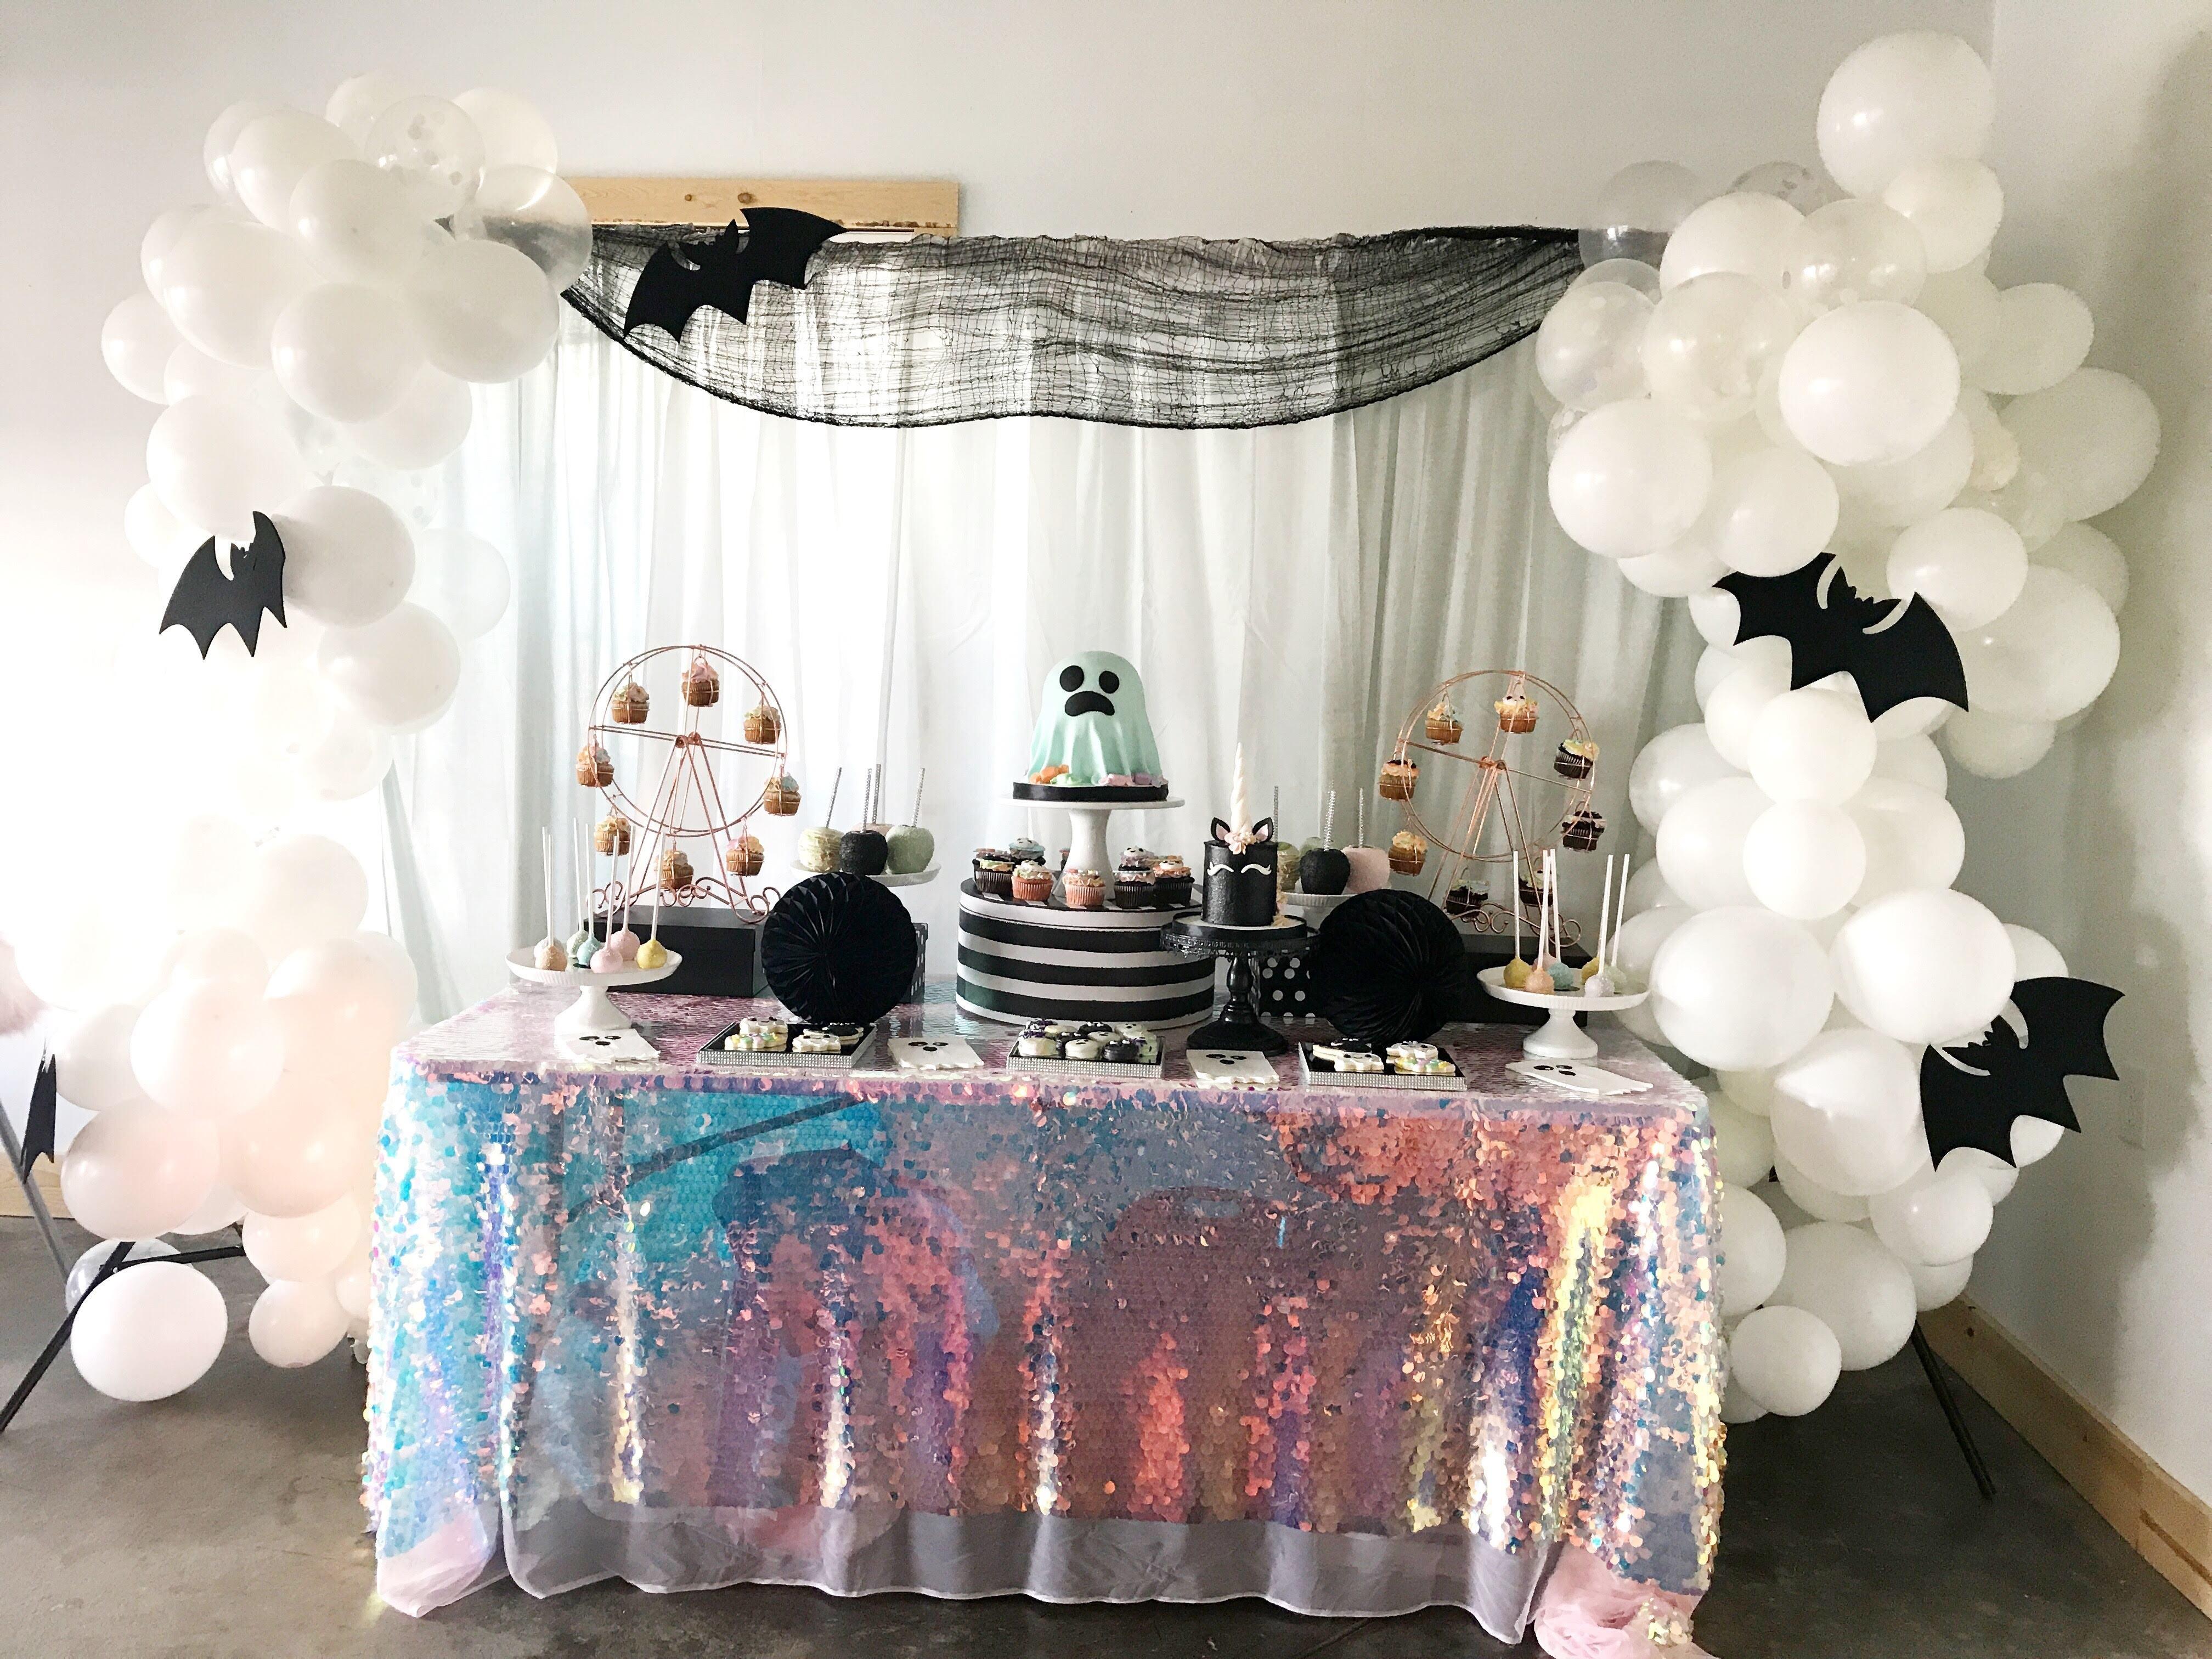 Kids Birthday Party Space Rental